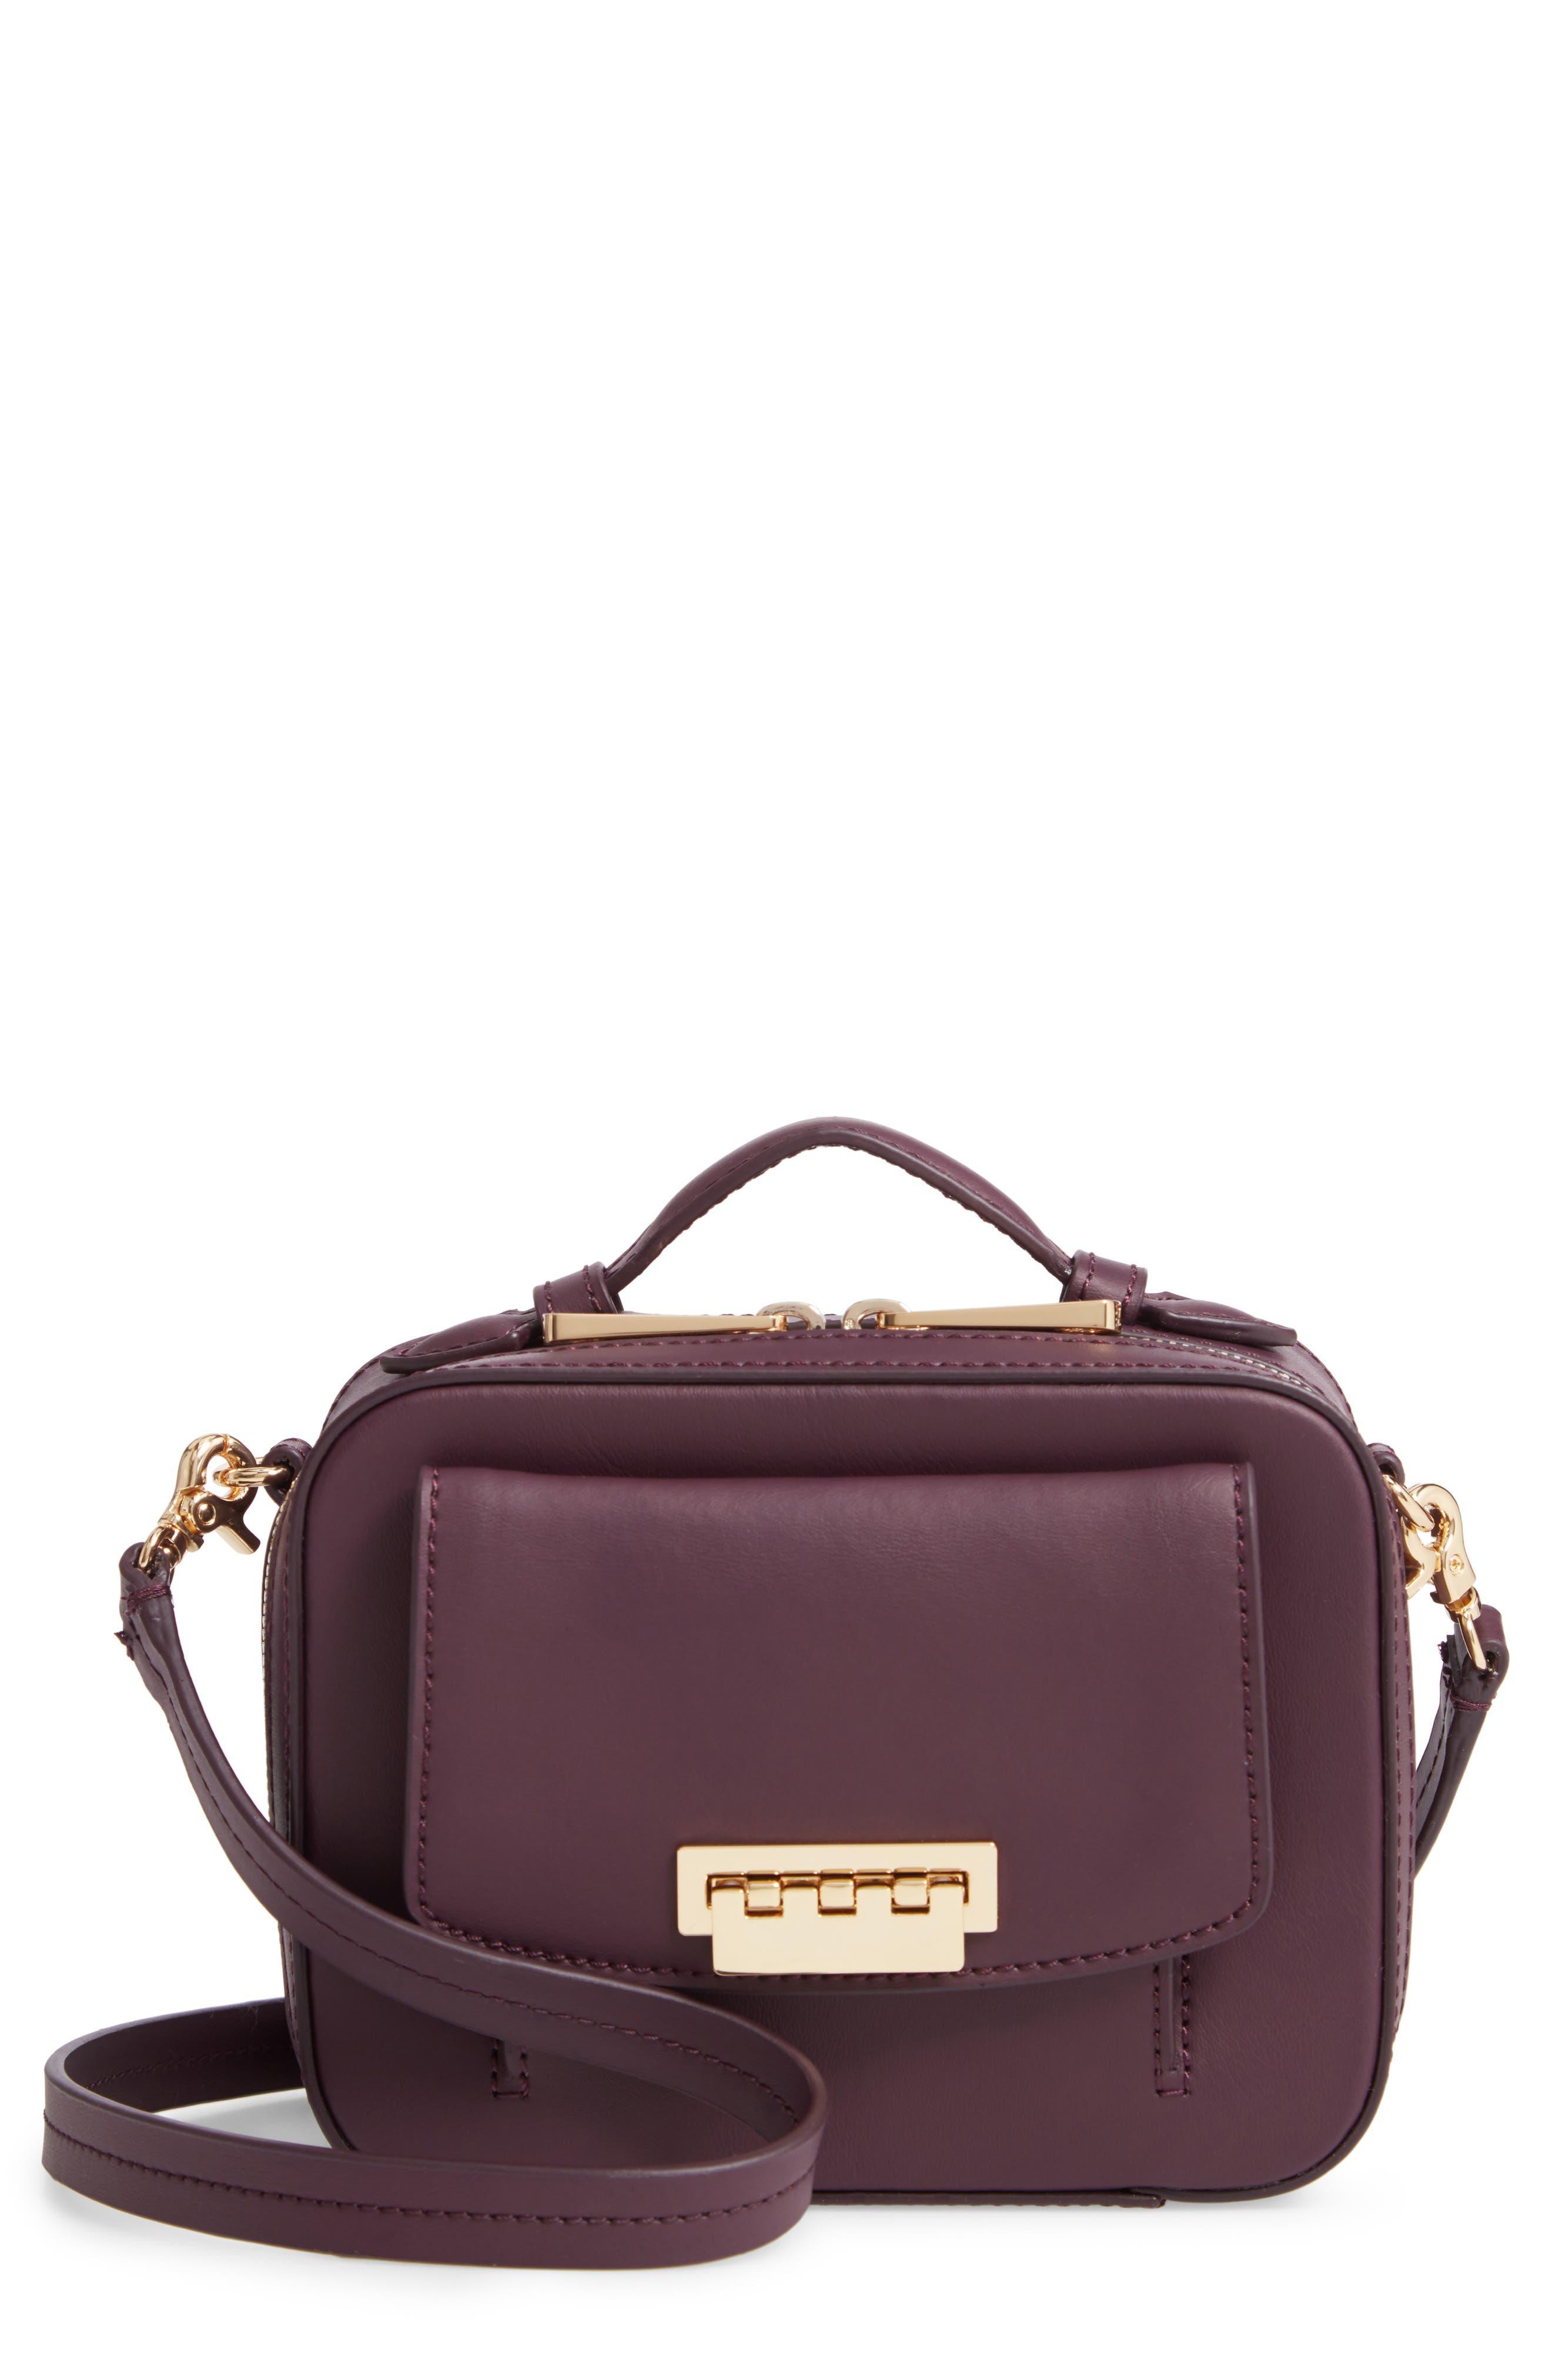 ZAC ZAC POSEN Earthette Small Box Leather Crossbody Bag, Main, color, 501